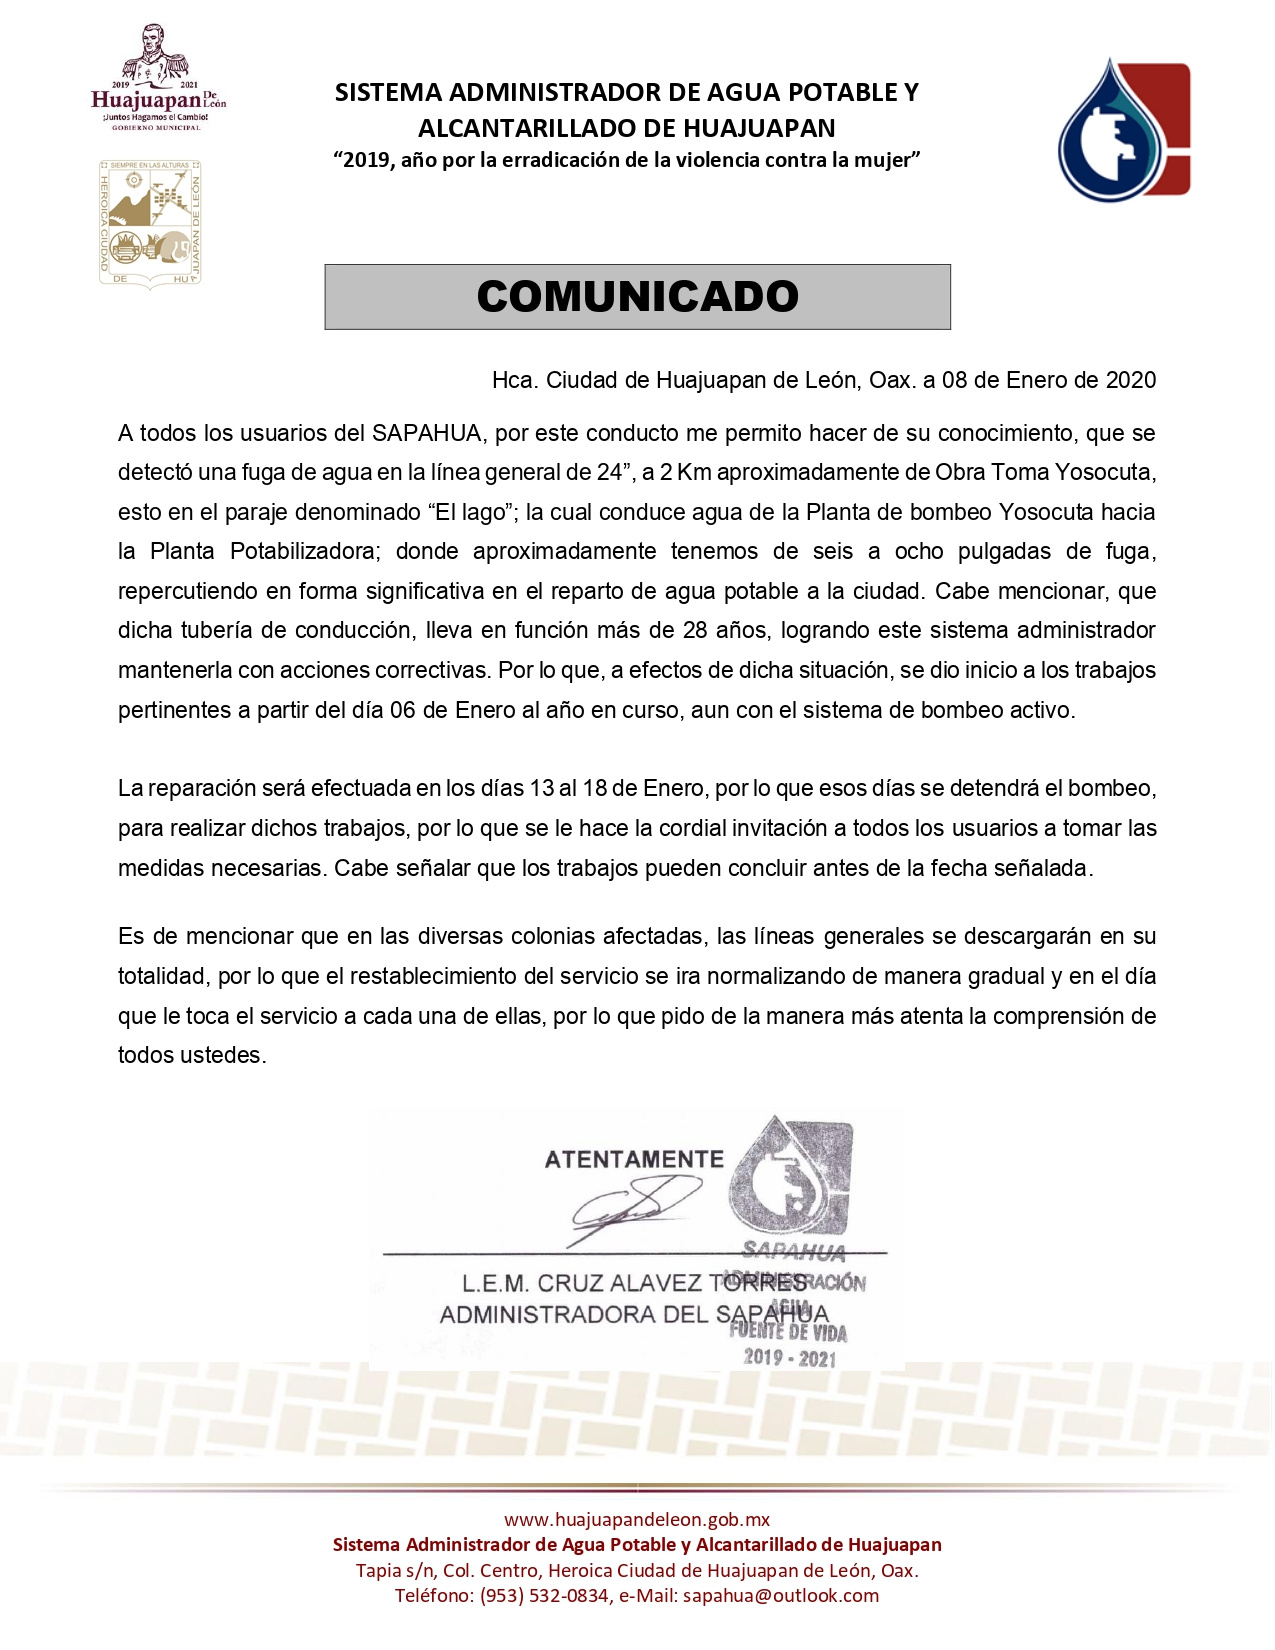 https://0201.nccdn.net/4_2/000/000/038/2d3/comunicado-fuga-lago-yosocuta_page-0001-1275x1650.jpg